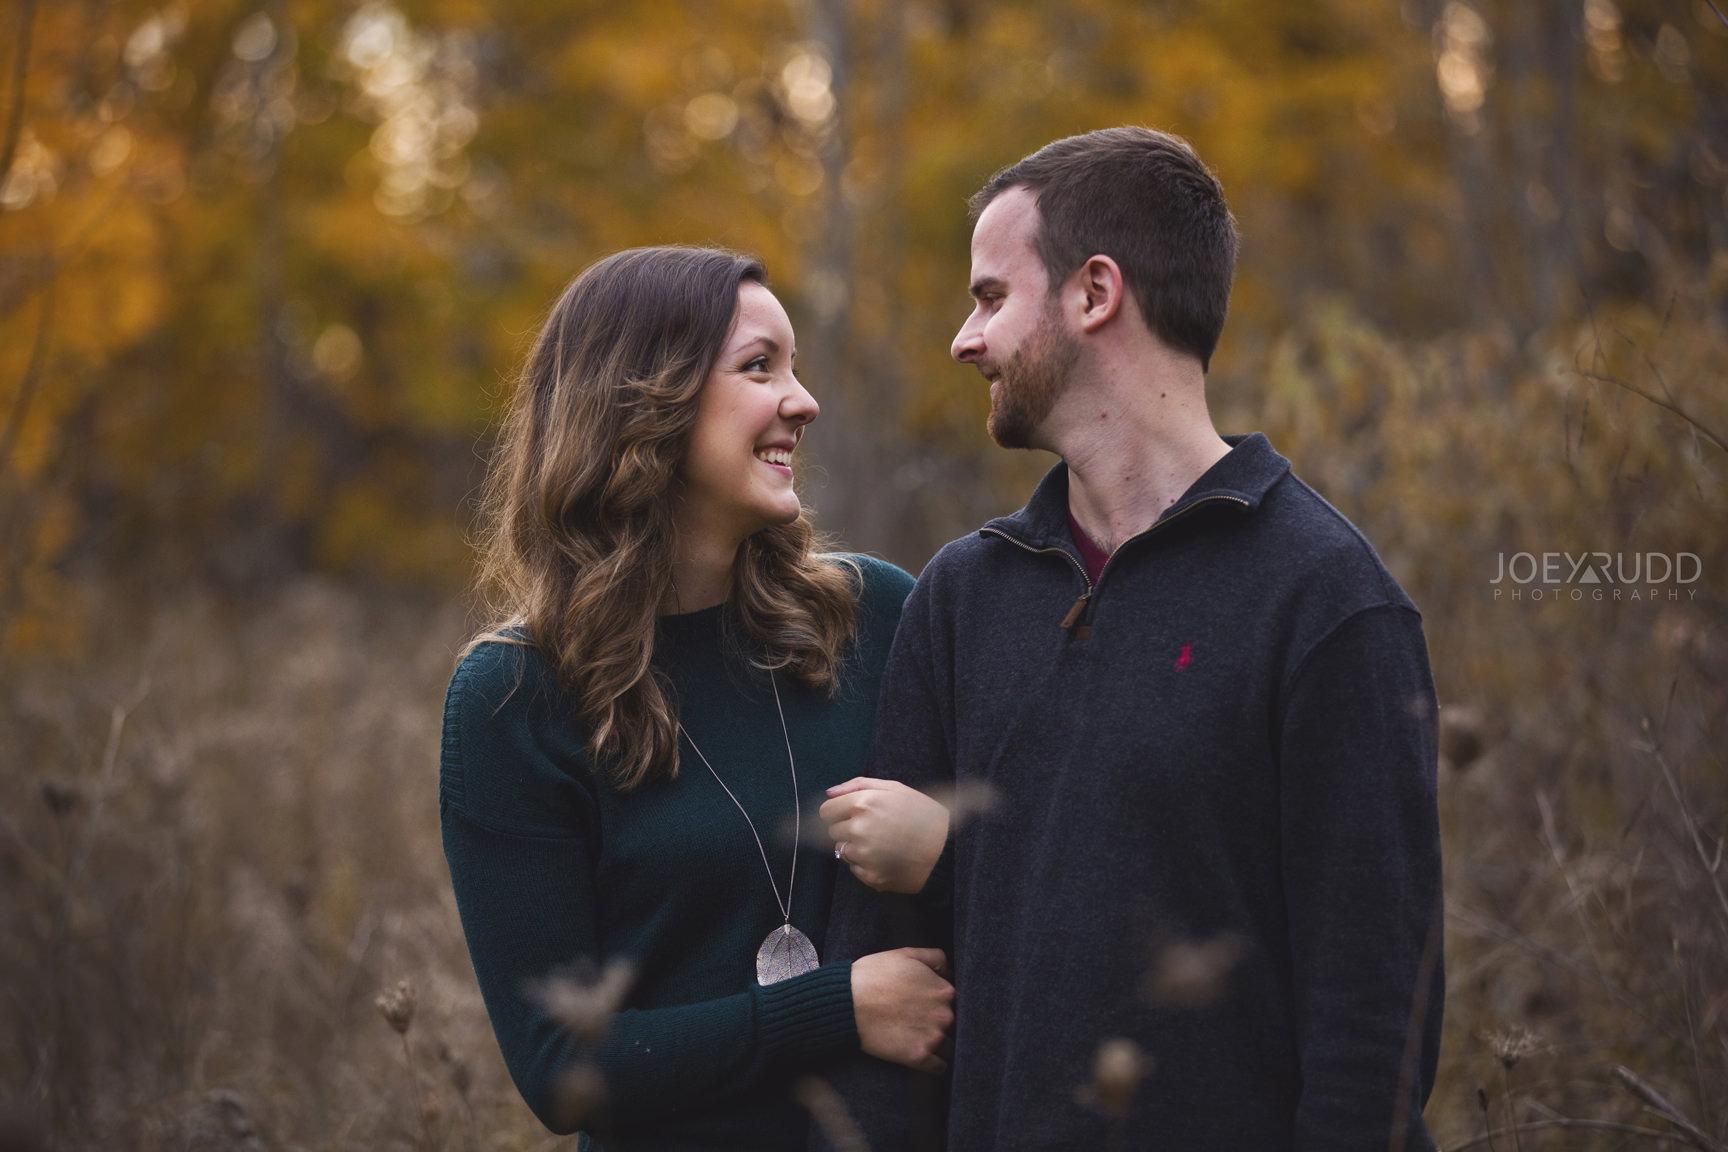 Brockville Engagement Photo by Wedding Photographer Joey Rudd Photography